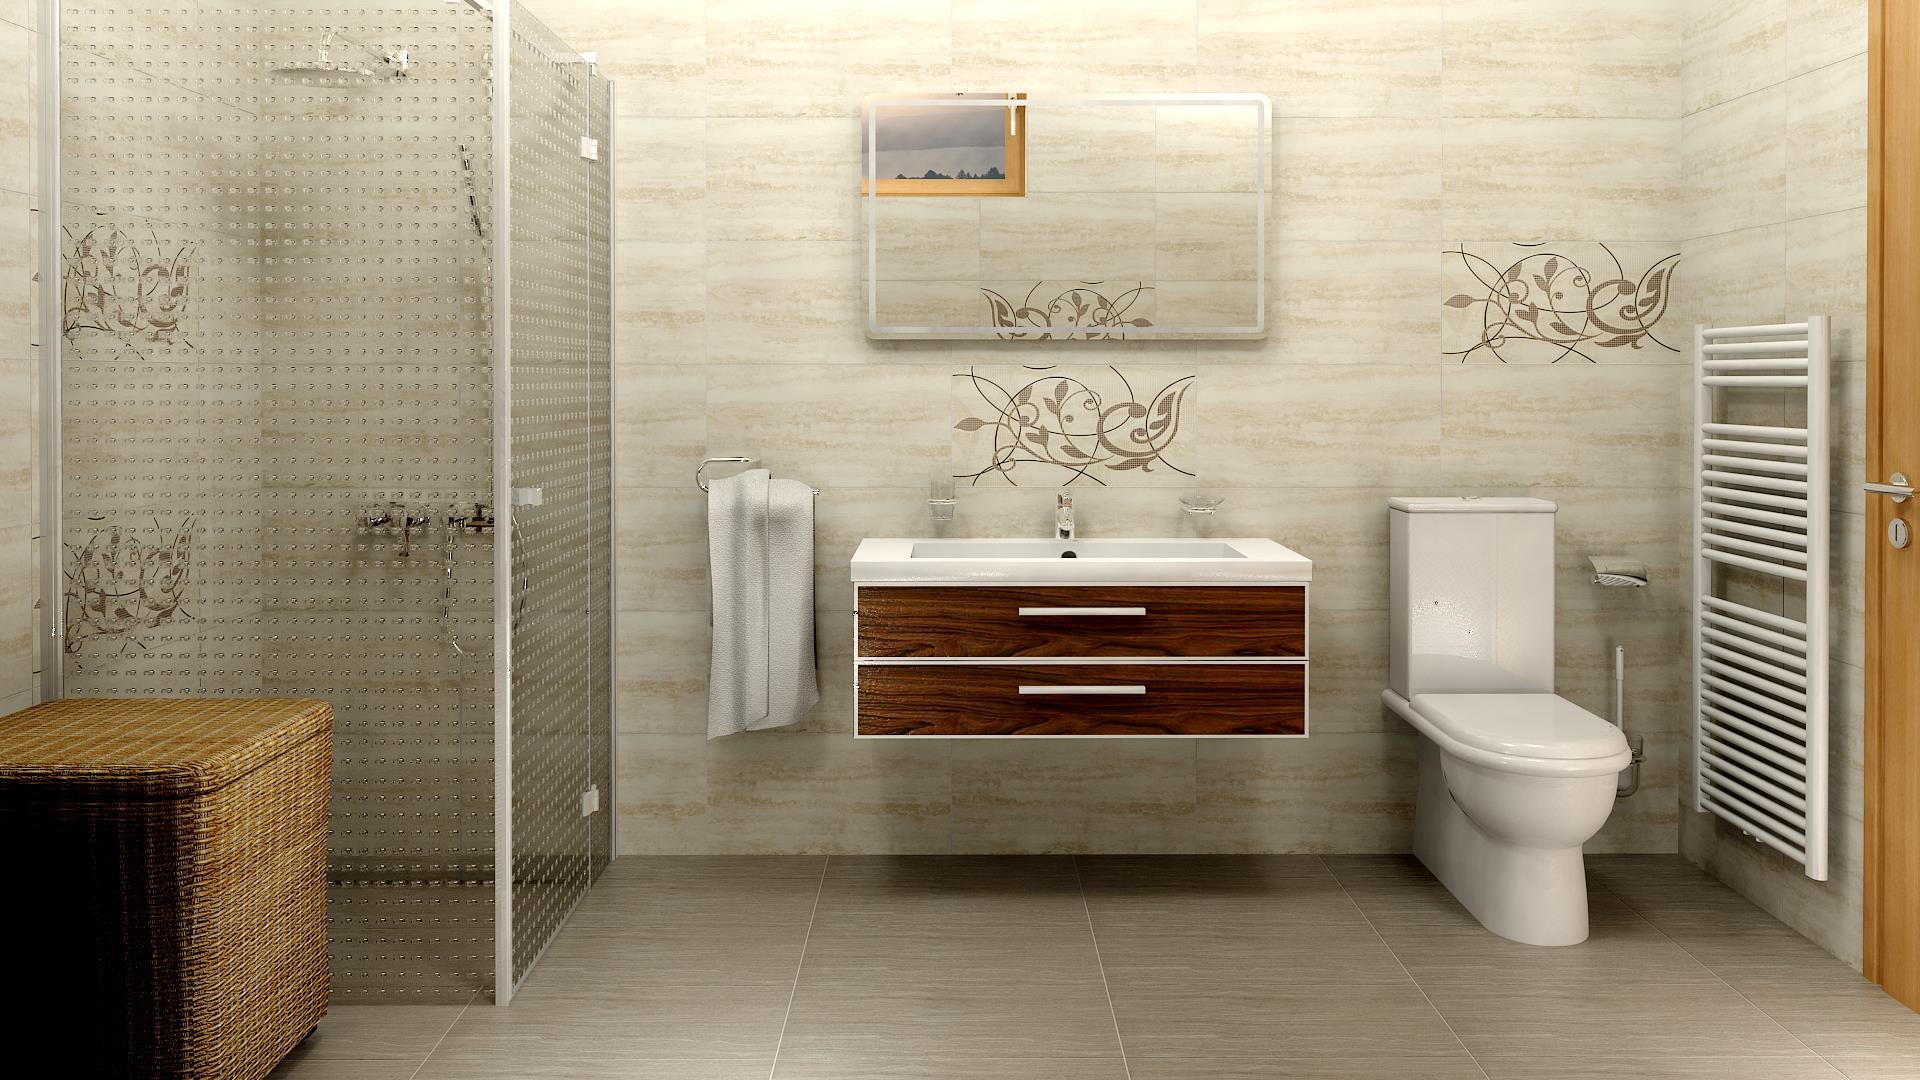 Amiche10 Bathroom Von Szép Otthon Pápa() auf dem ViSoft360 Portal